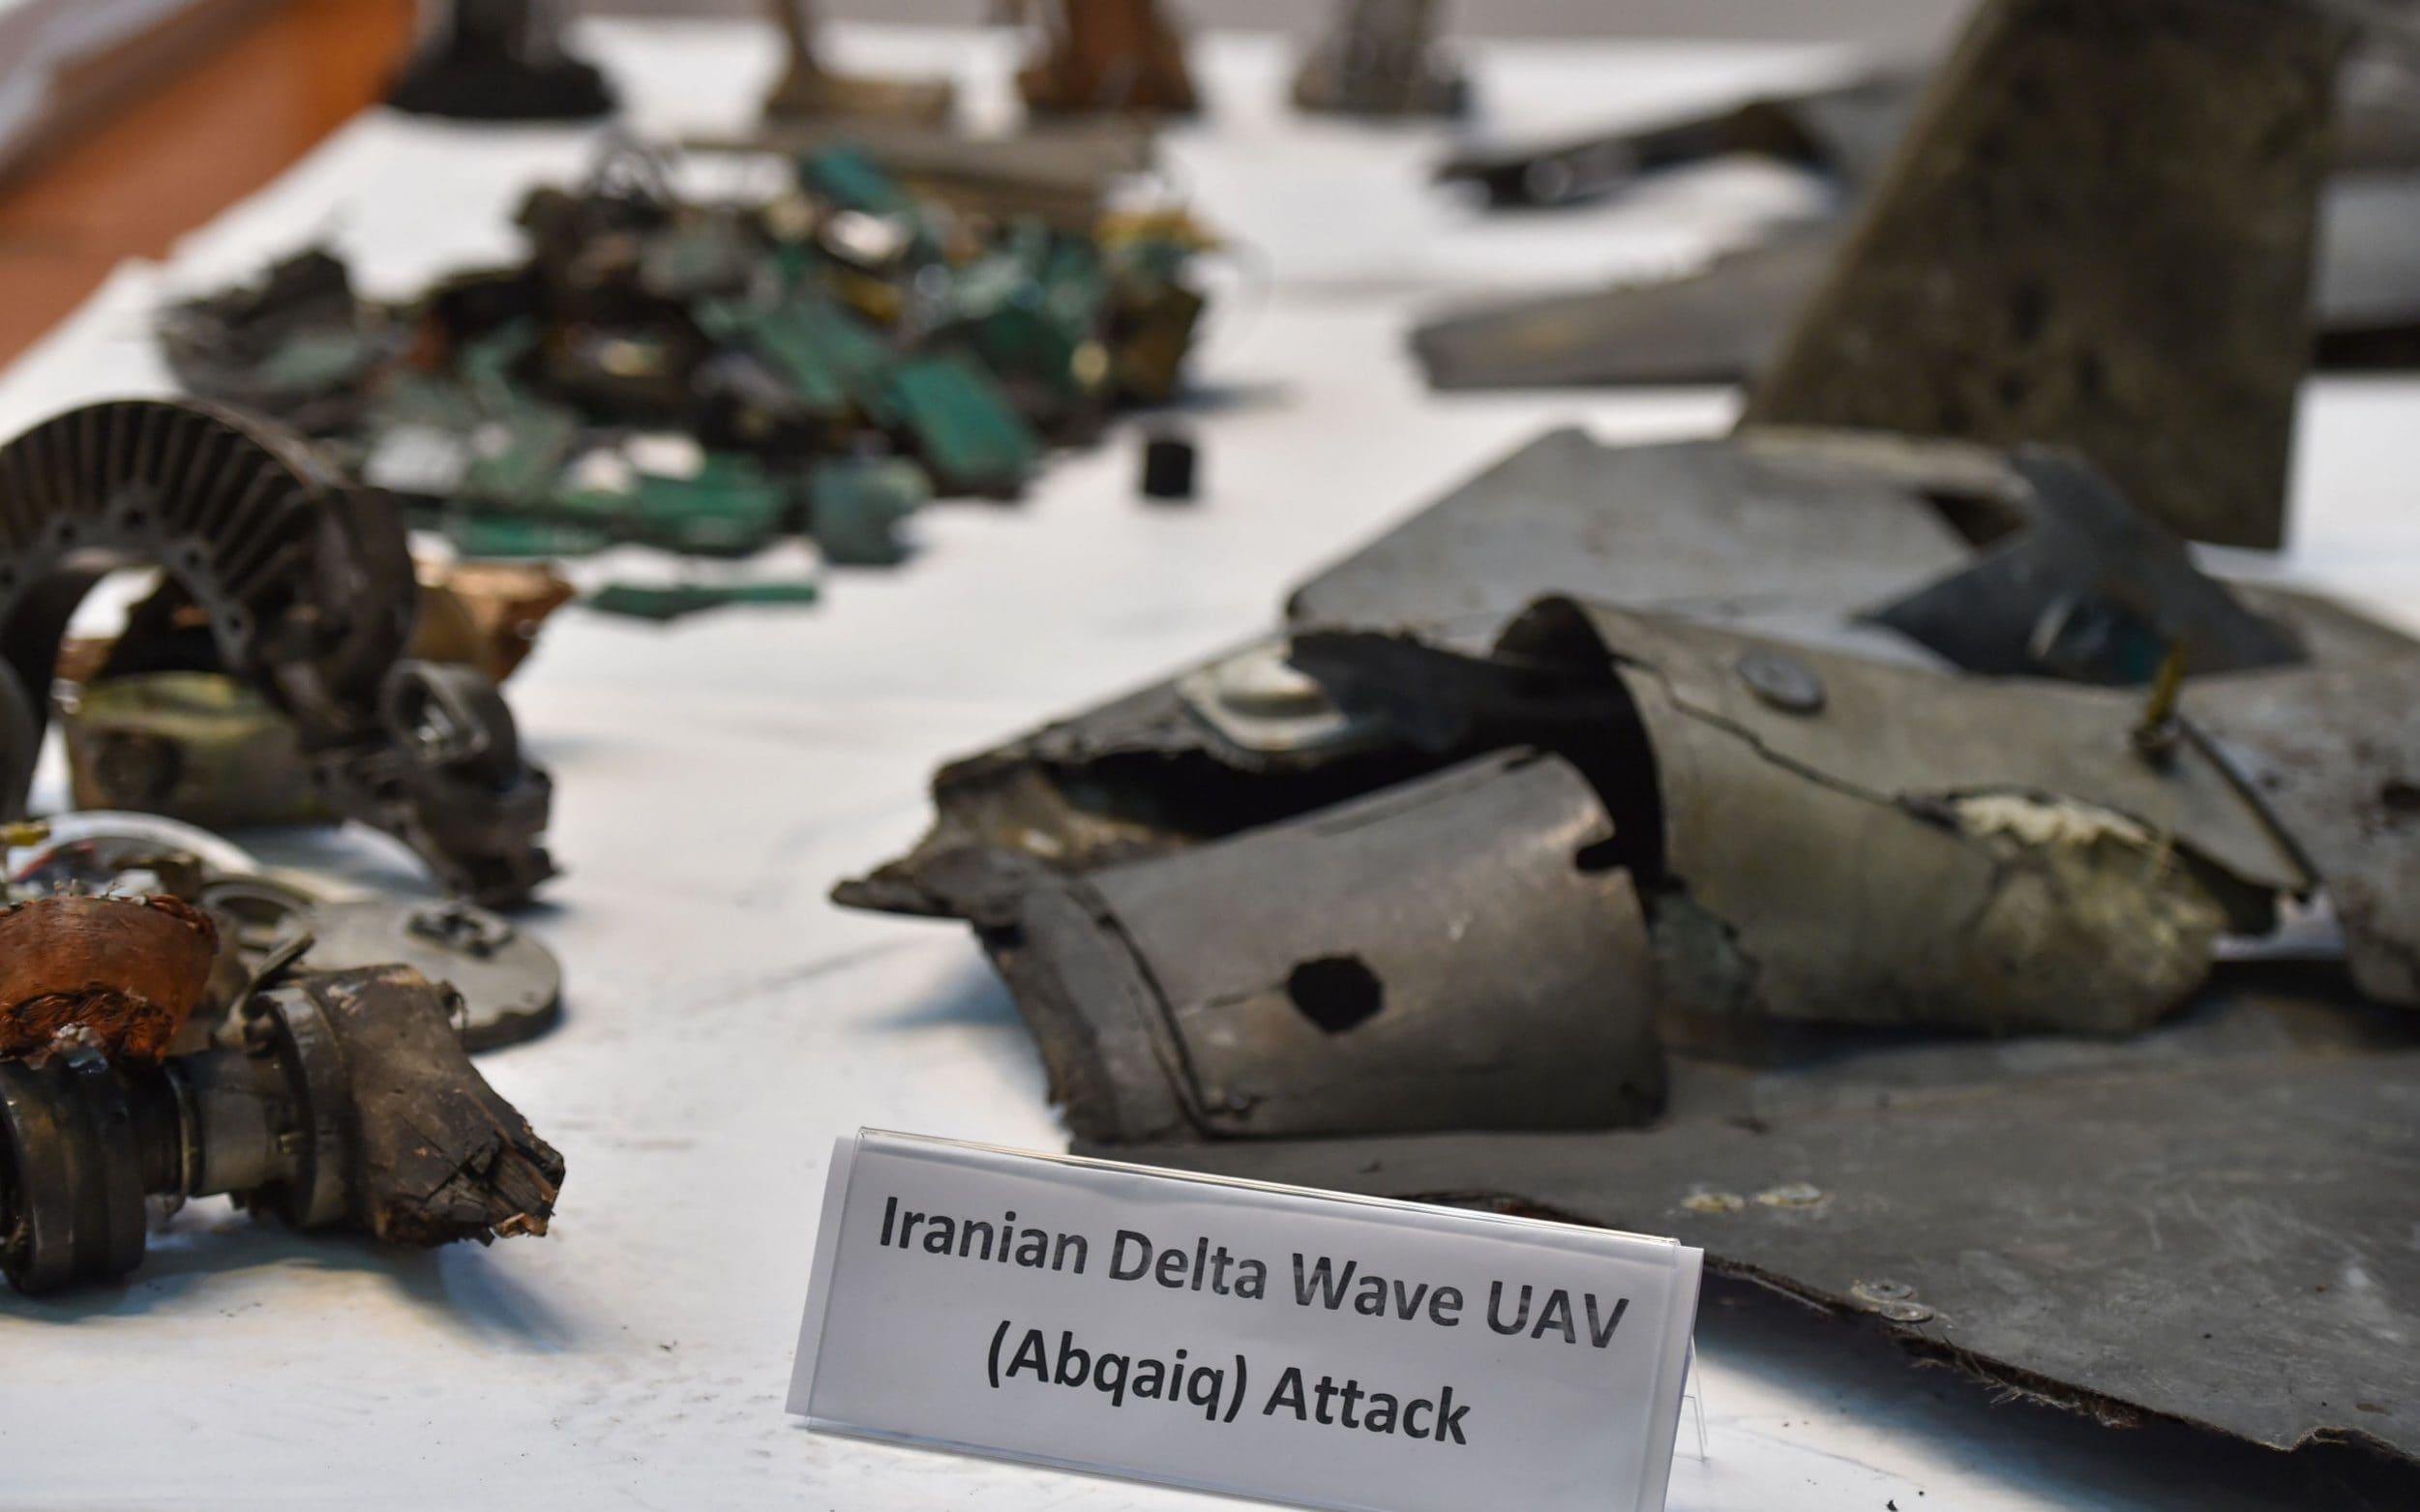 Trump slaps new sanctions on Iran as Saudi Arabia displays missile debris as proof Tehran backed oil attacks